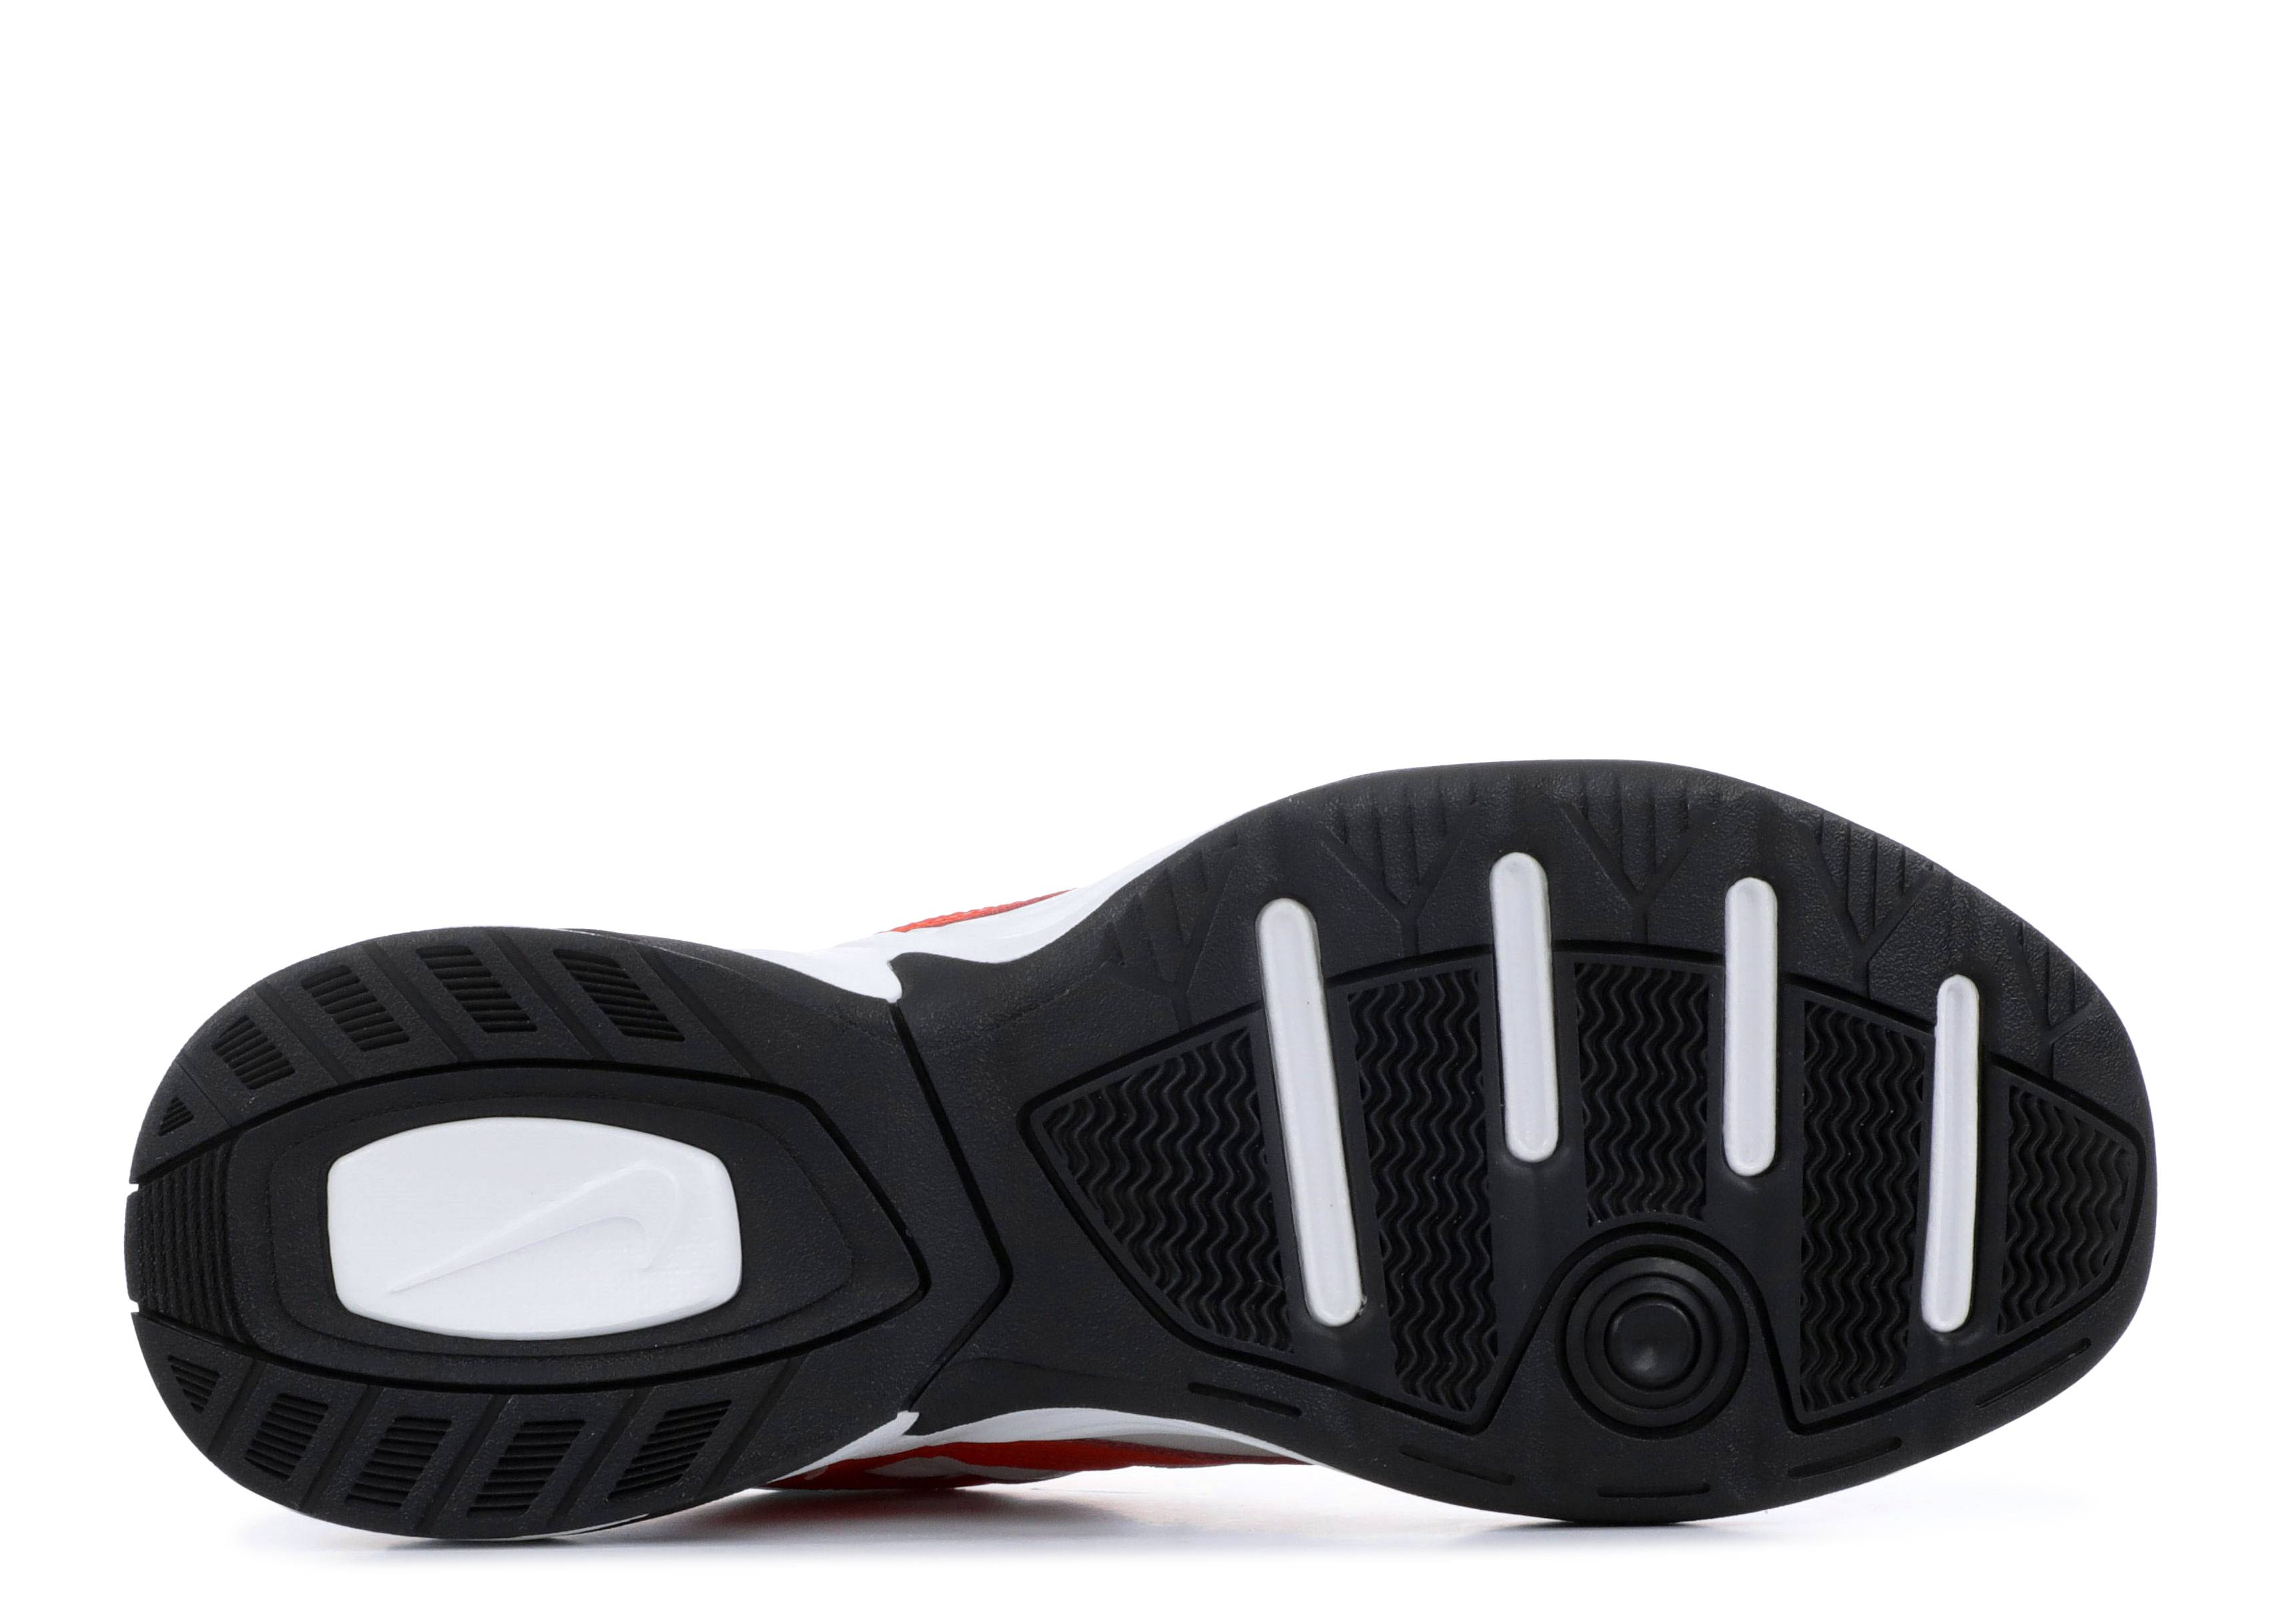 da19363859 Nike M2k Tekno - Nike - av4789 100 - summit white black-team orange ...